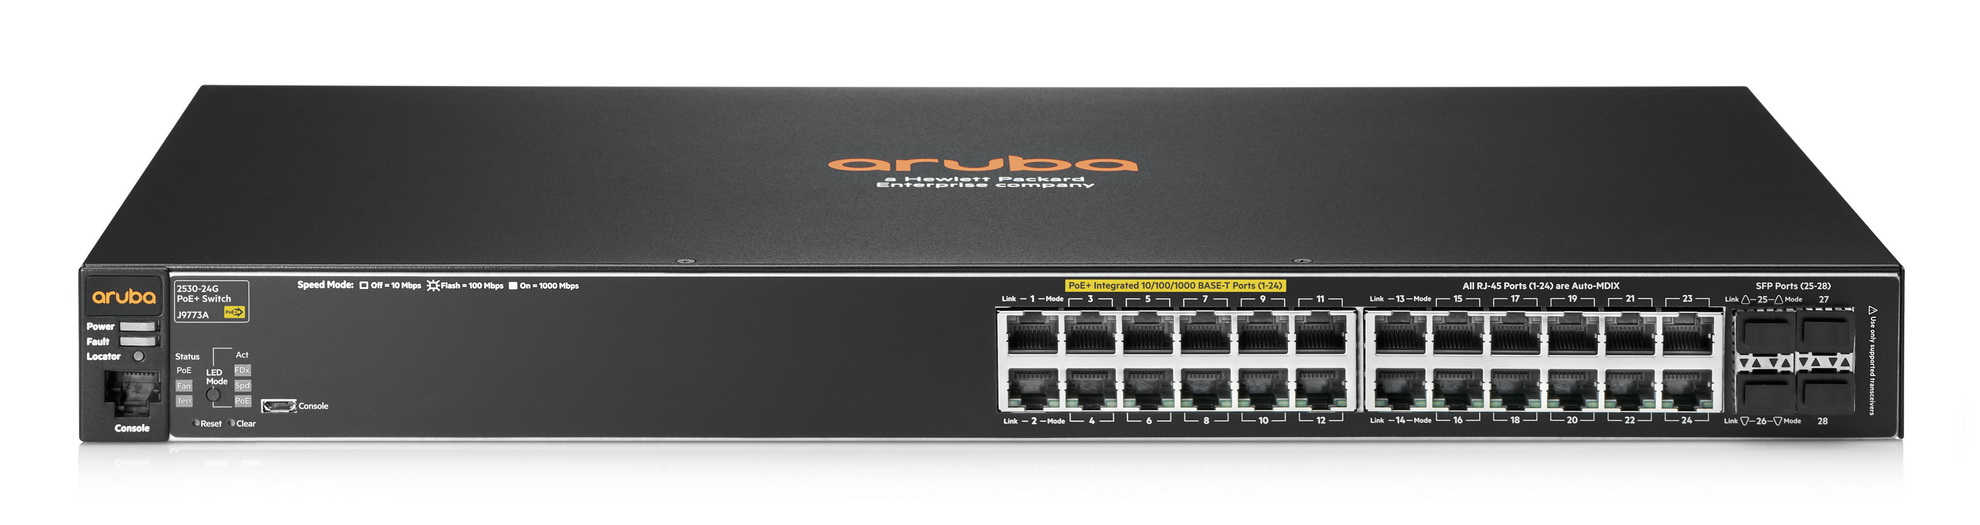 Hewlett Packard Enterprise Aruba 2530 24G PoE+ + Aruba Instant On AP12 (RW) Managed L2 Gigabit Ethernet (10/100/1000) Black 1U Power over Ethernet (PoE)